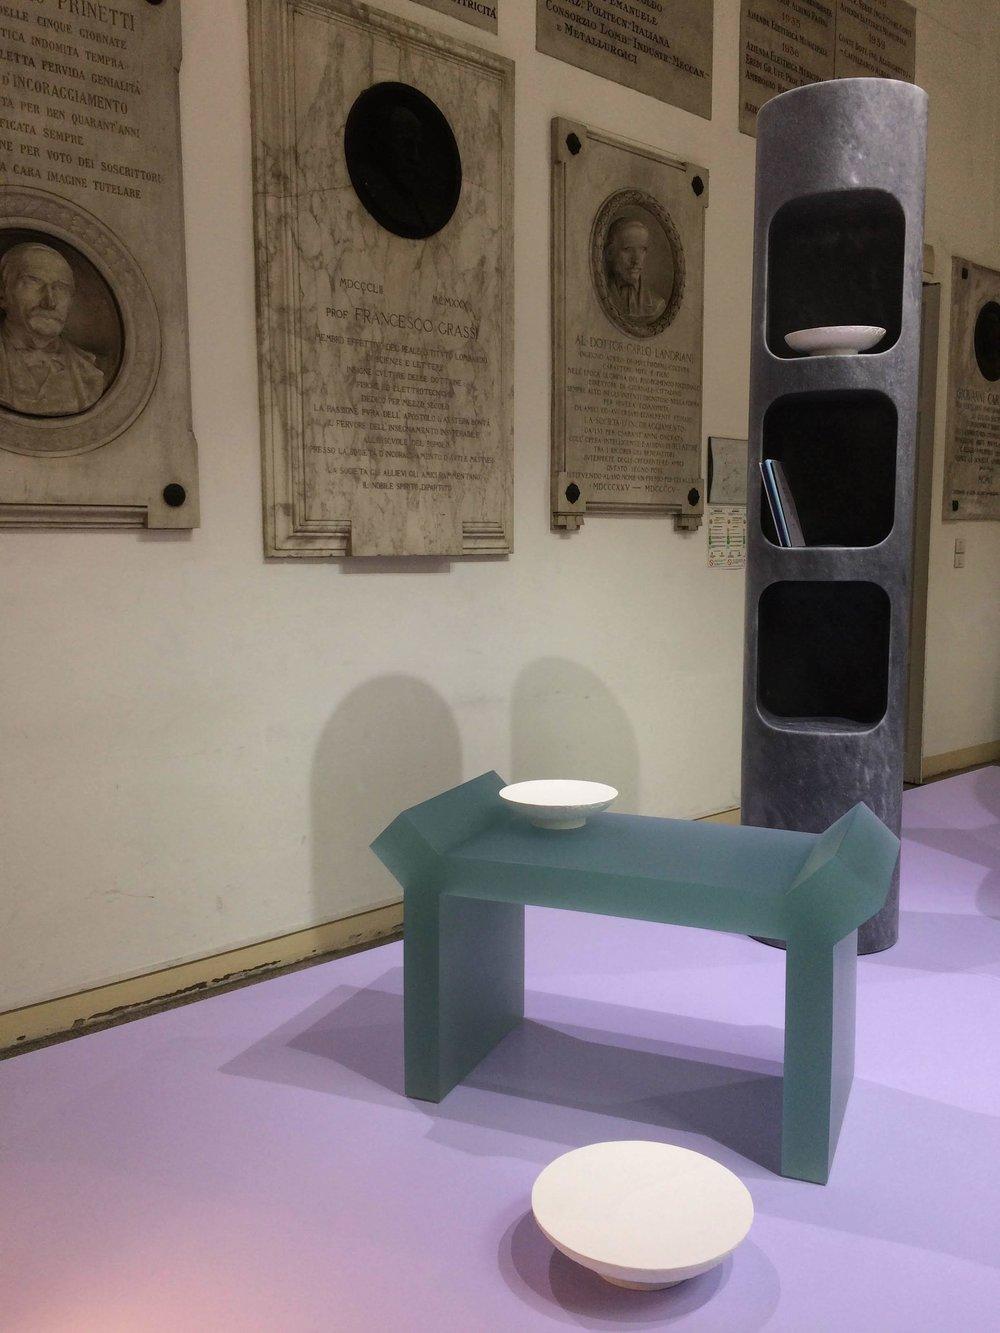 Constantin stool by Francesco Balzano and Totem book shelf by Joris Poggioli. THEOREME EDITIONS